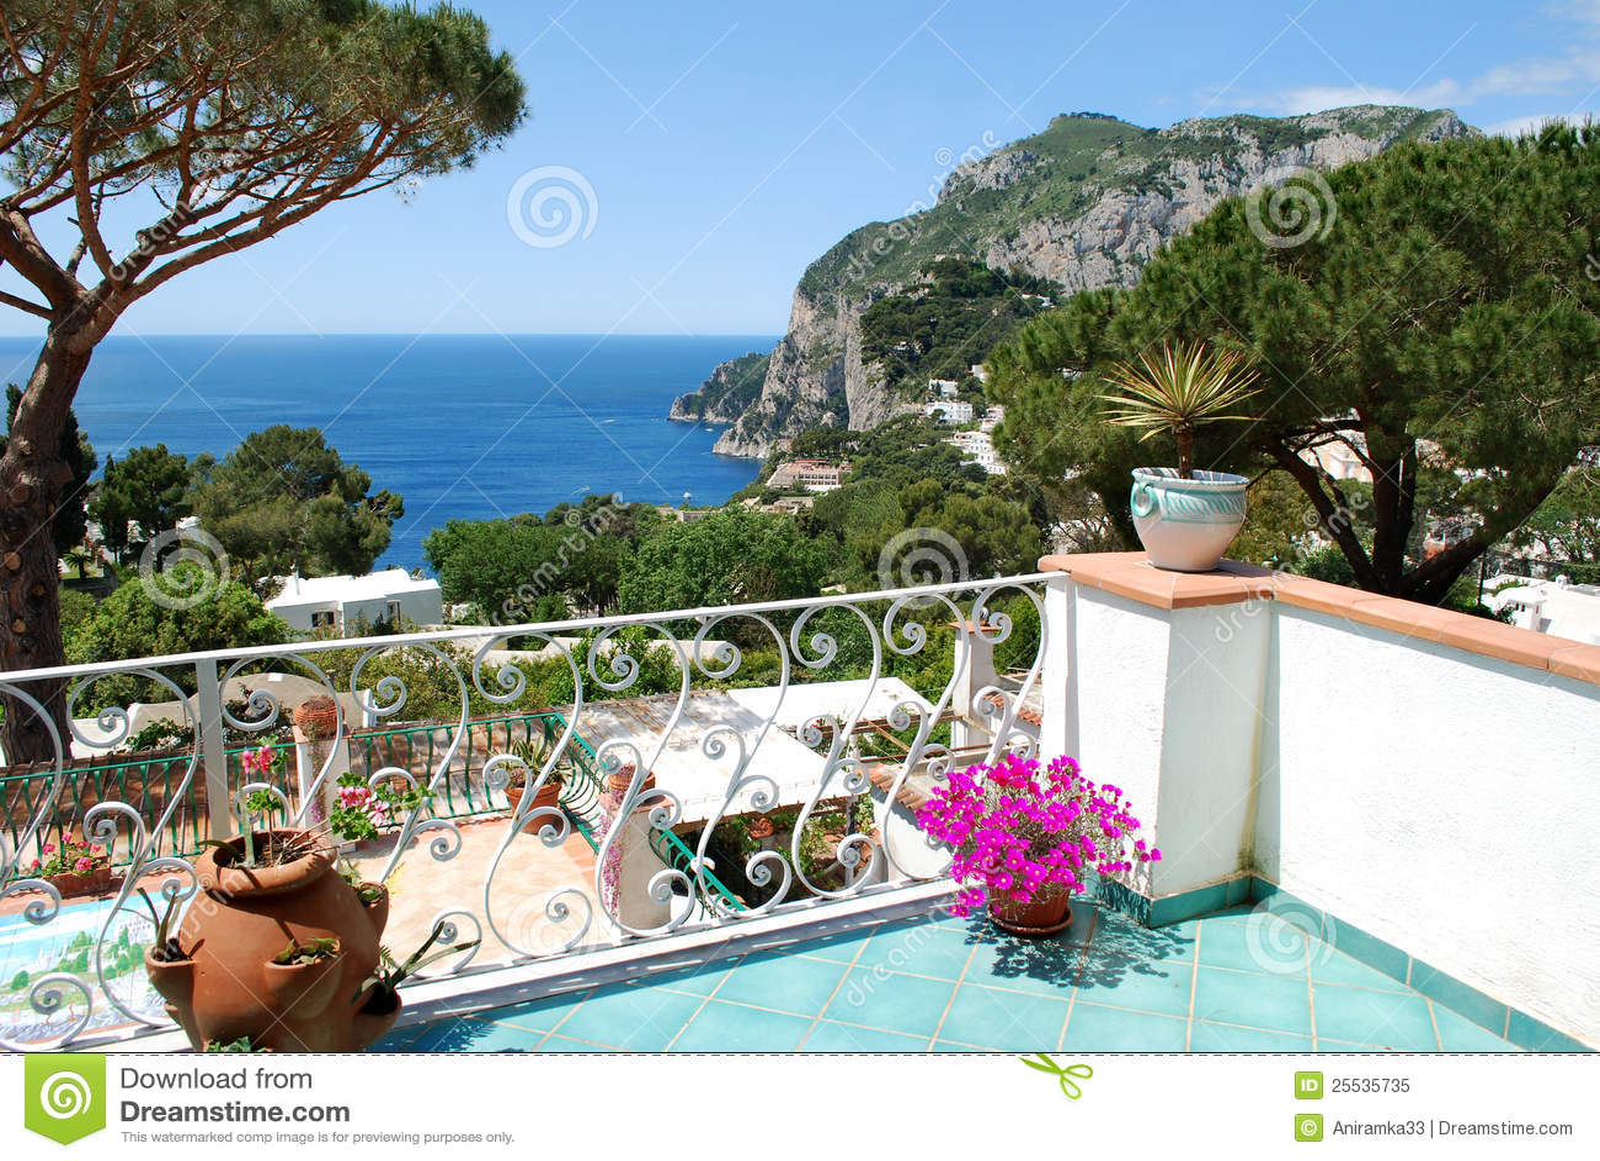 """capri, balcony view"" стоковая фотография и роялти-фри изобр."